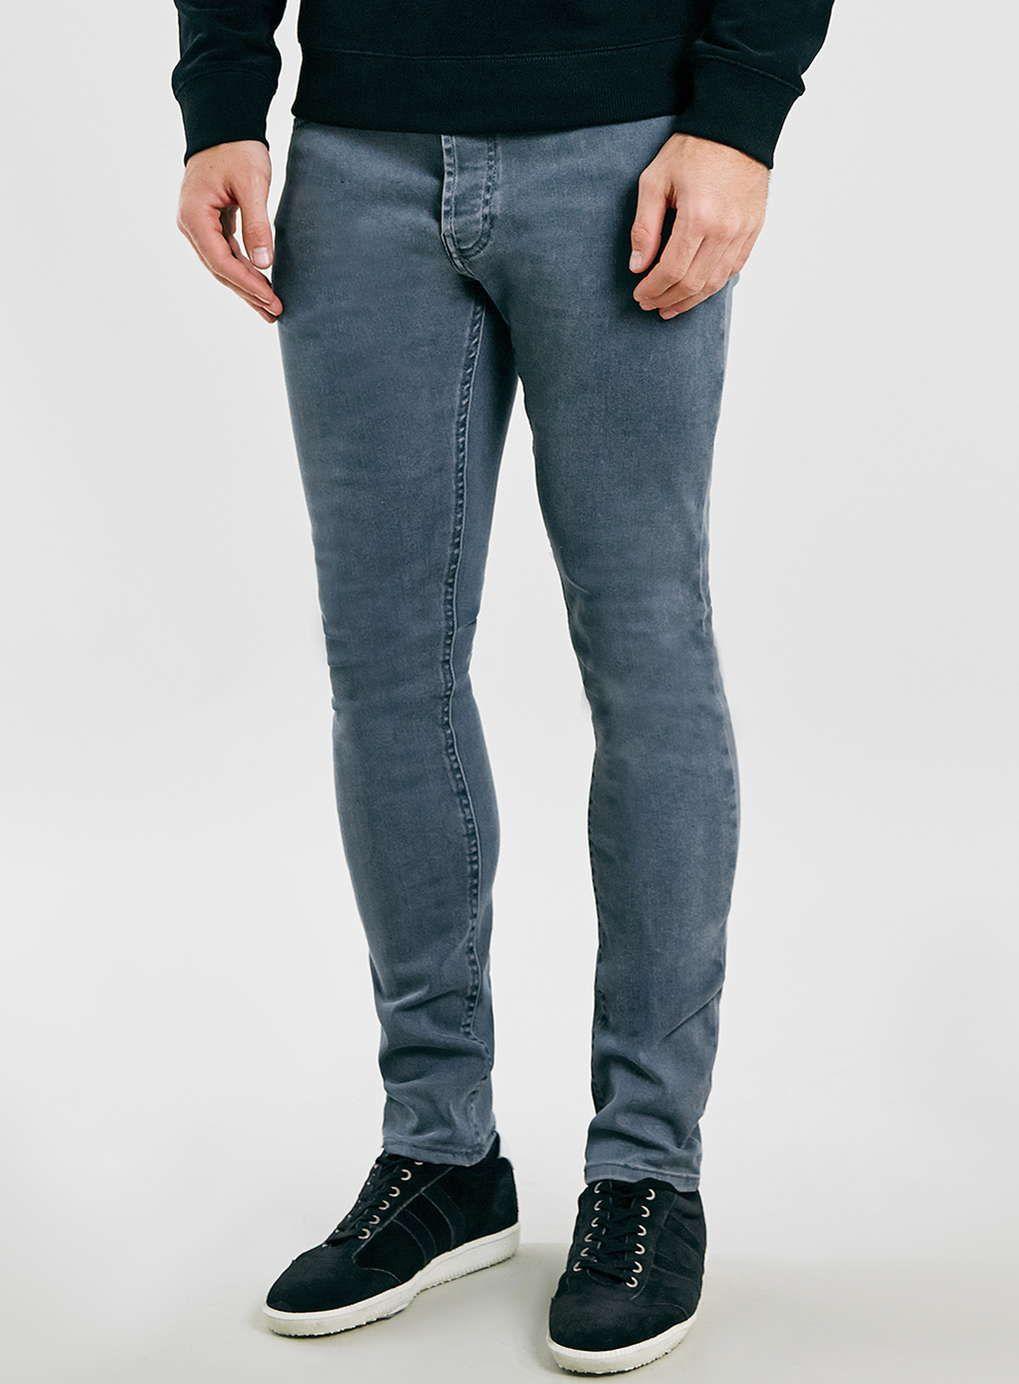 Smokey Blue Stretch Skinny Jeans | Blue, Skinny jeans and Skinny